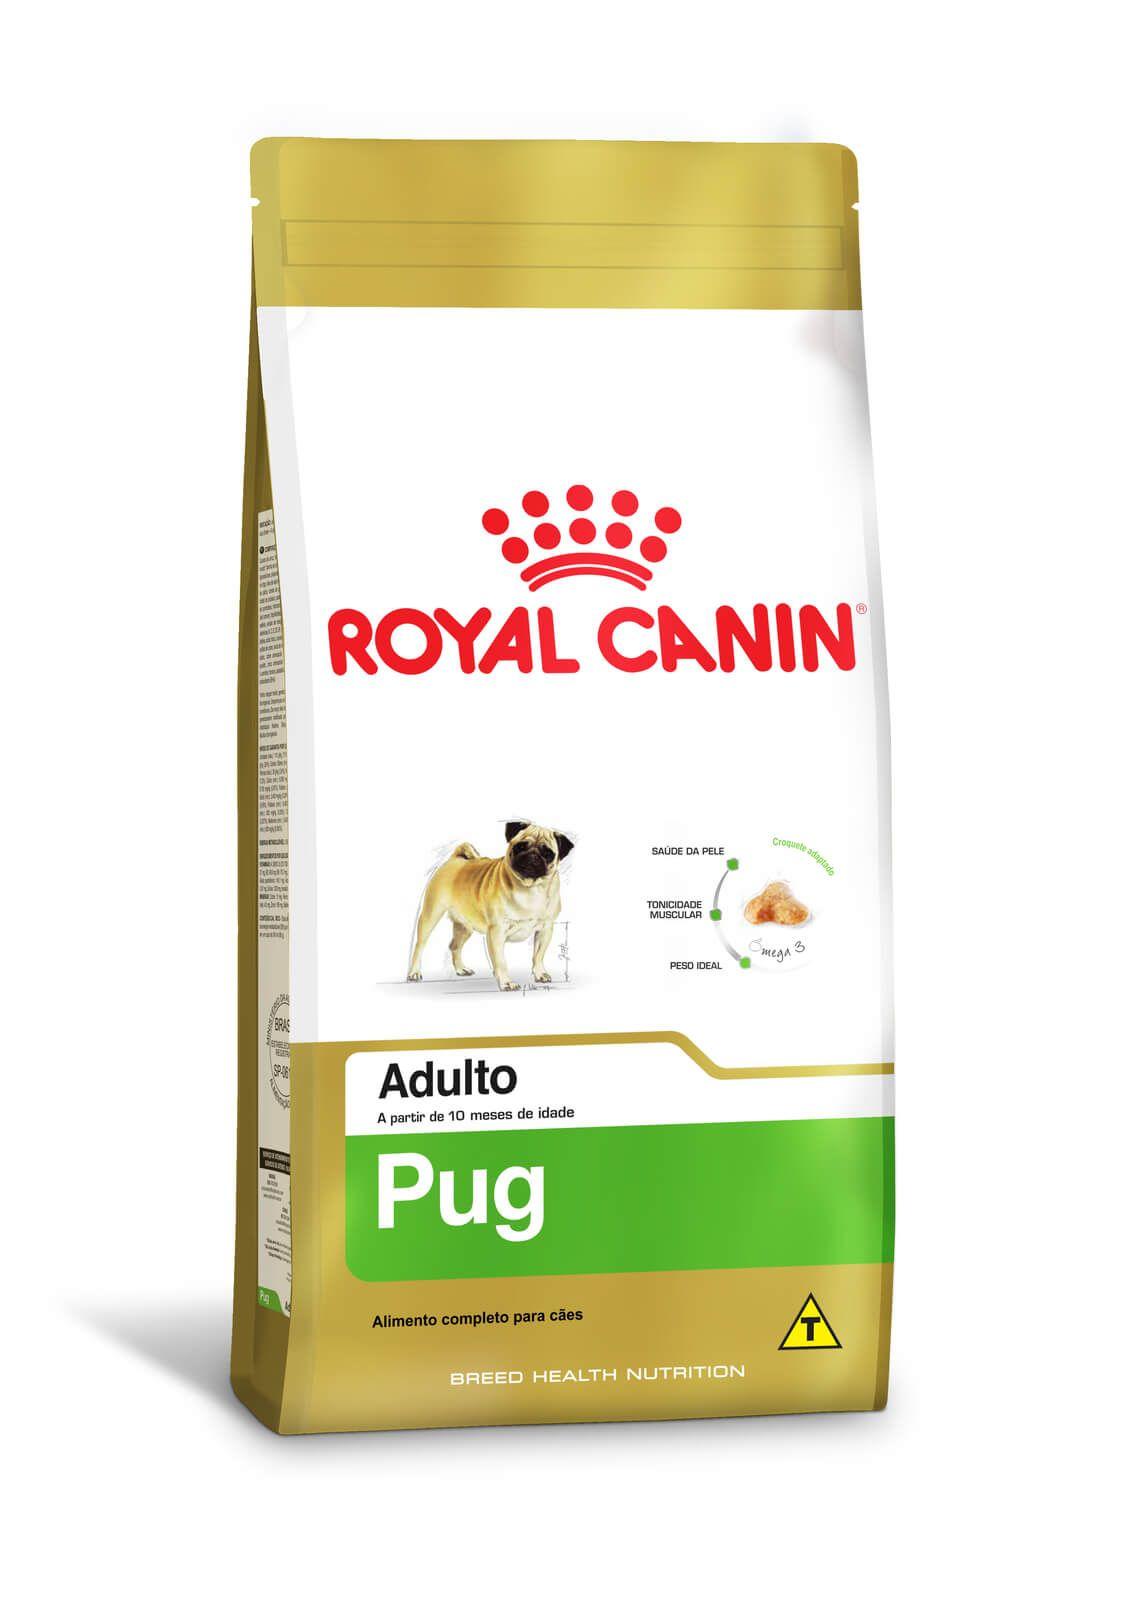 Ração Royal Canin Pug Adult